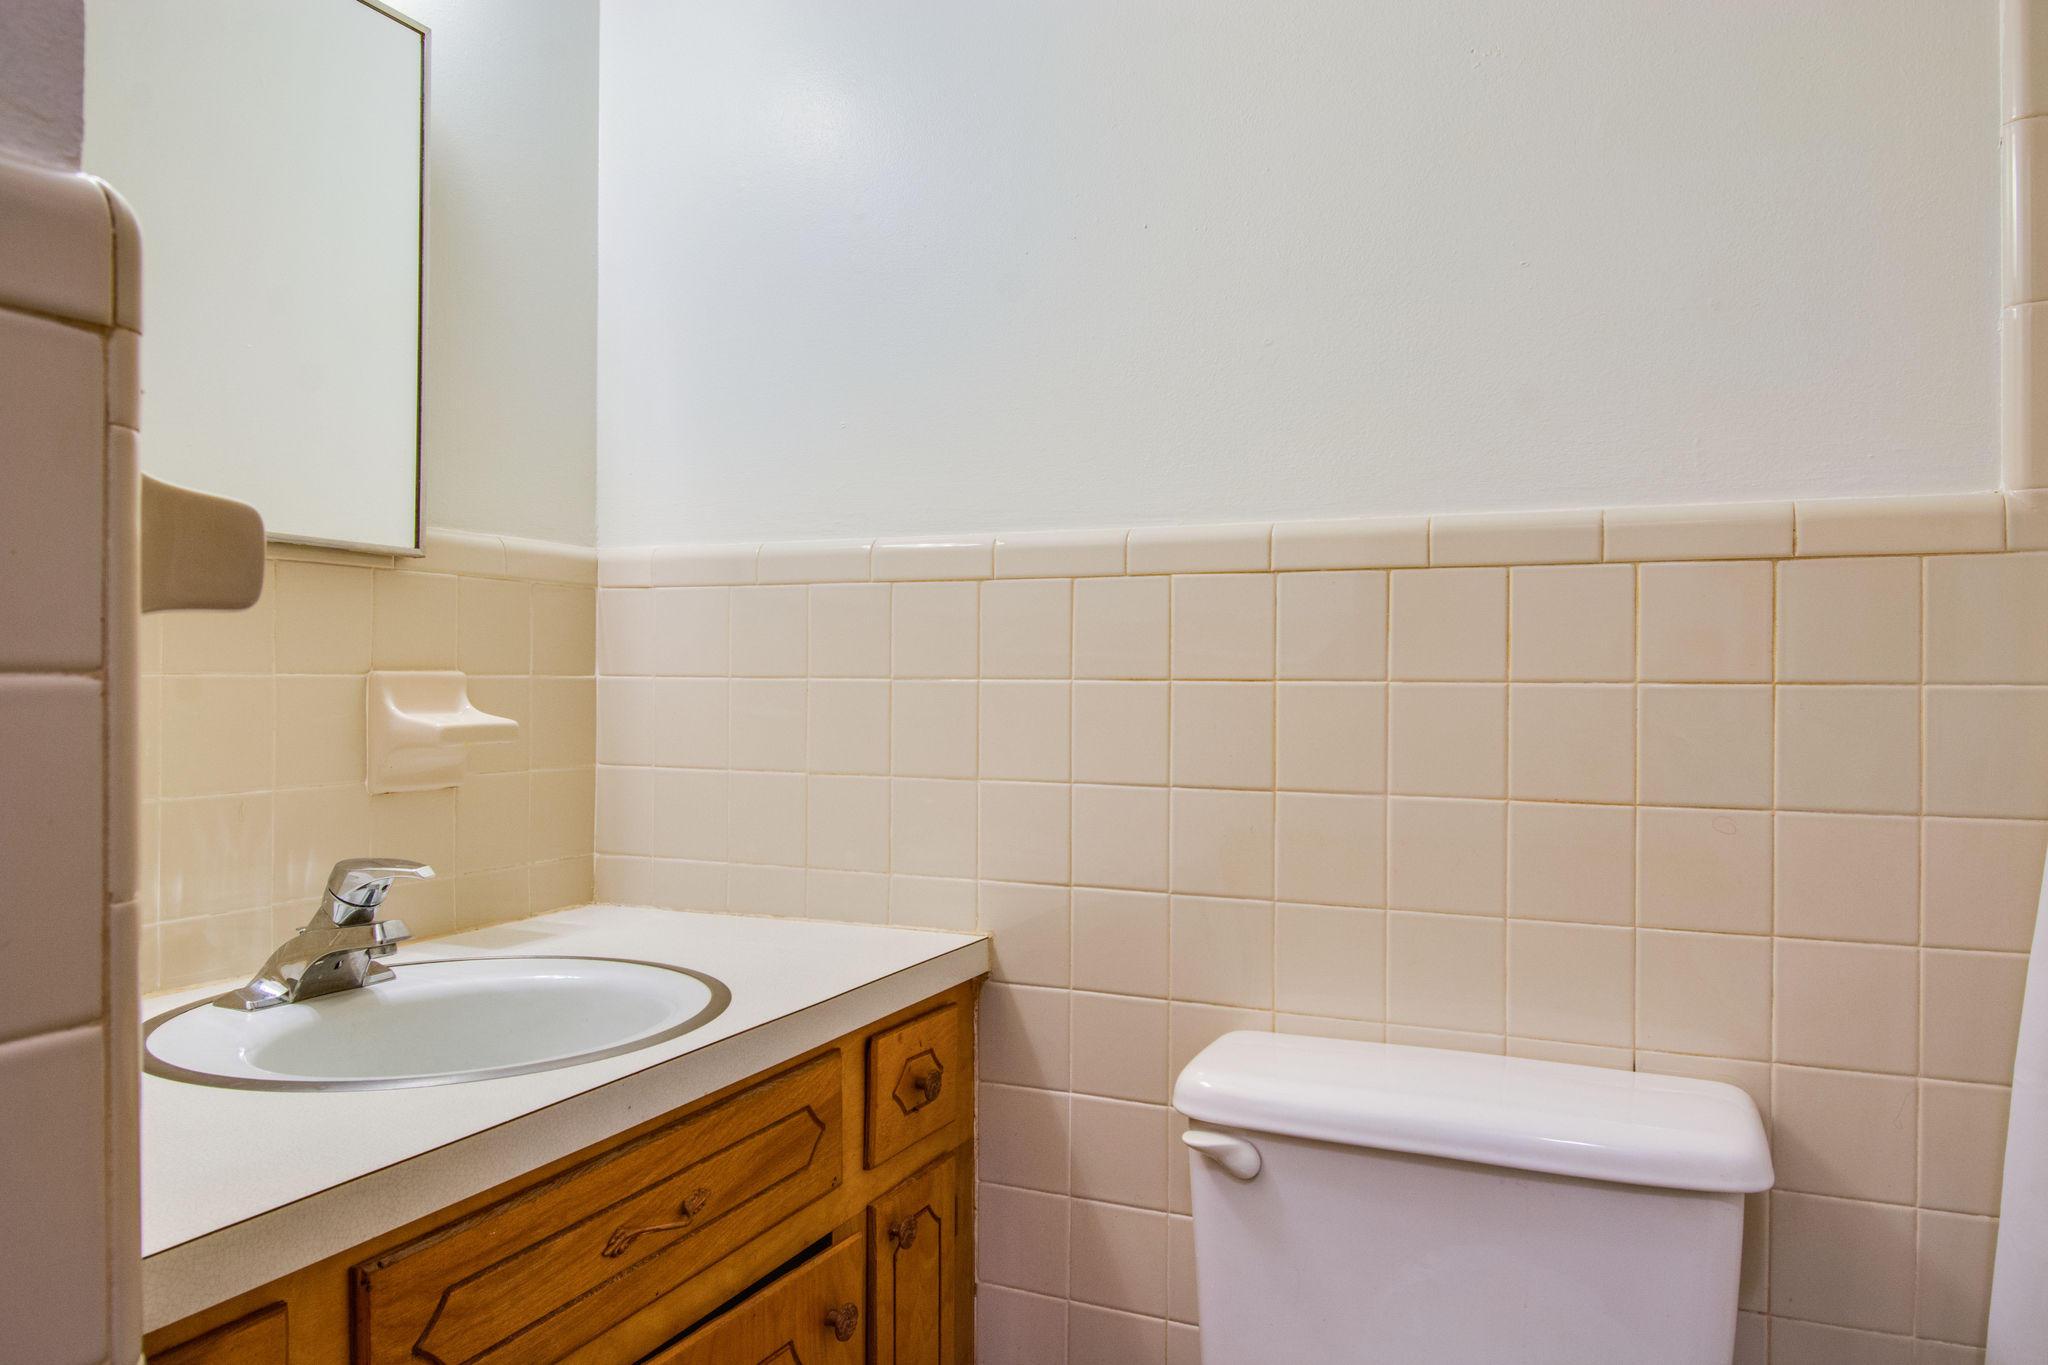 Old Mt Pleasant Homes For Sale - 1327 Lonnie, Mount Pleasant, SC - 20